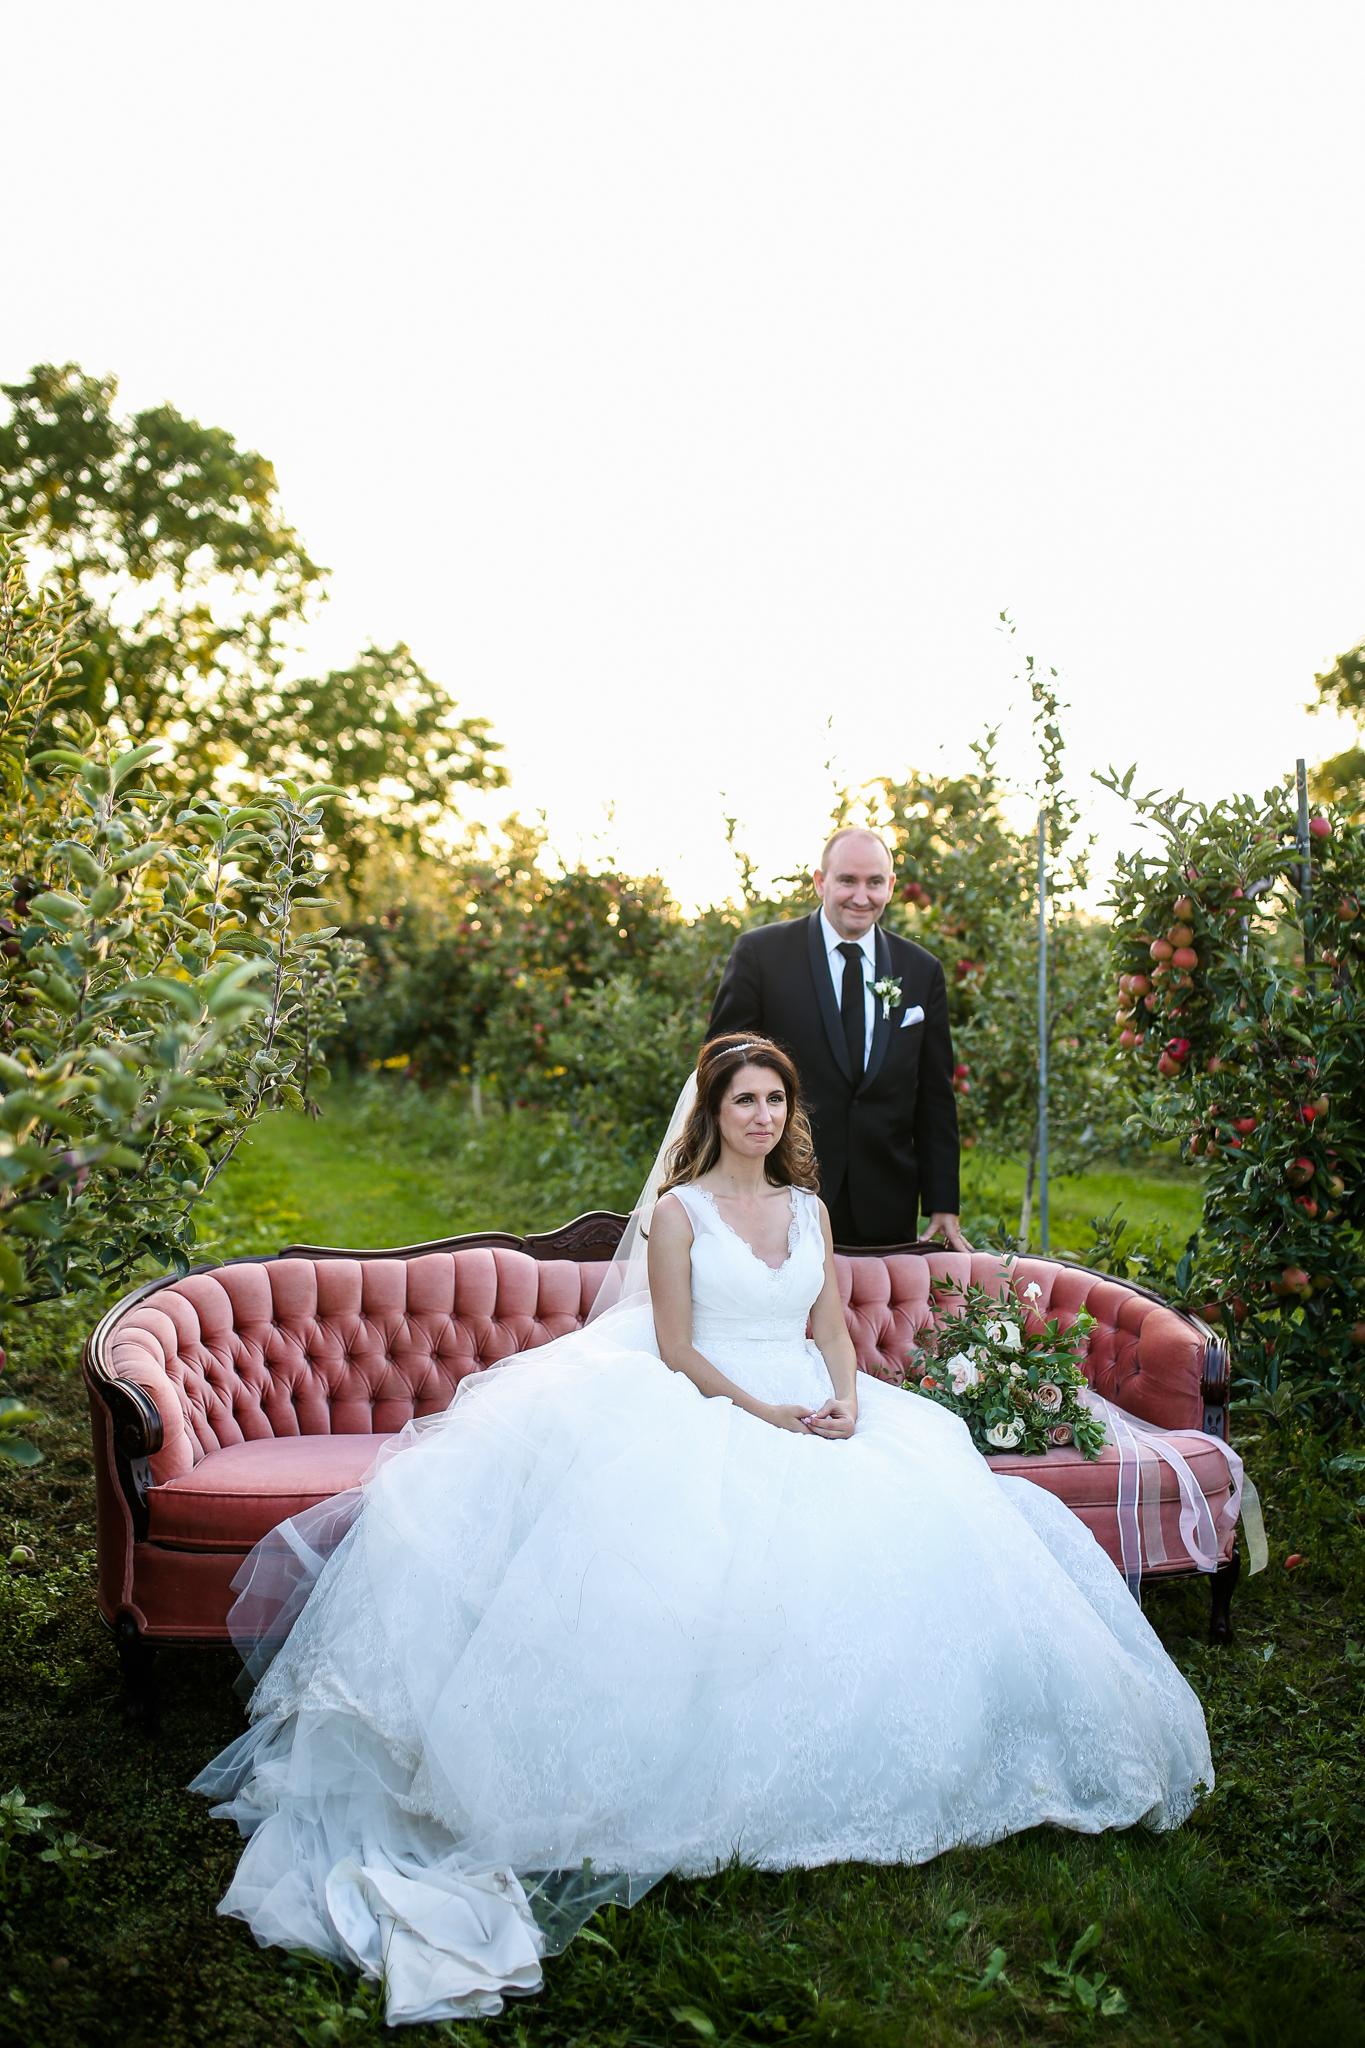 Outdoor Orchard Wedding Hamilton Ontario - spunkysapphire.com